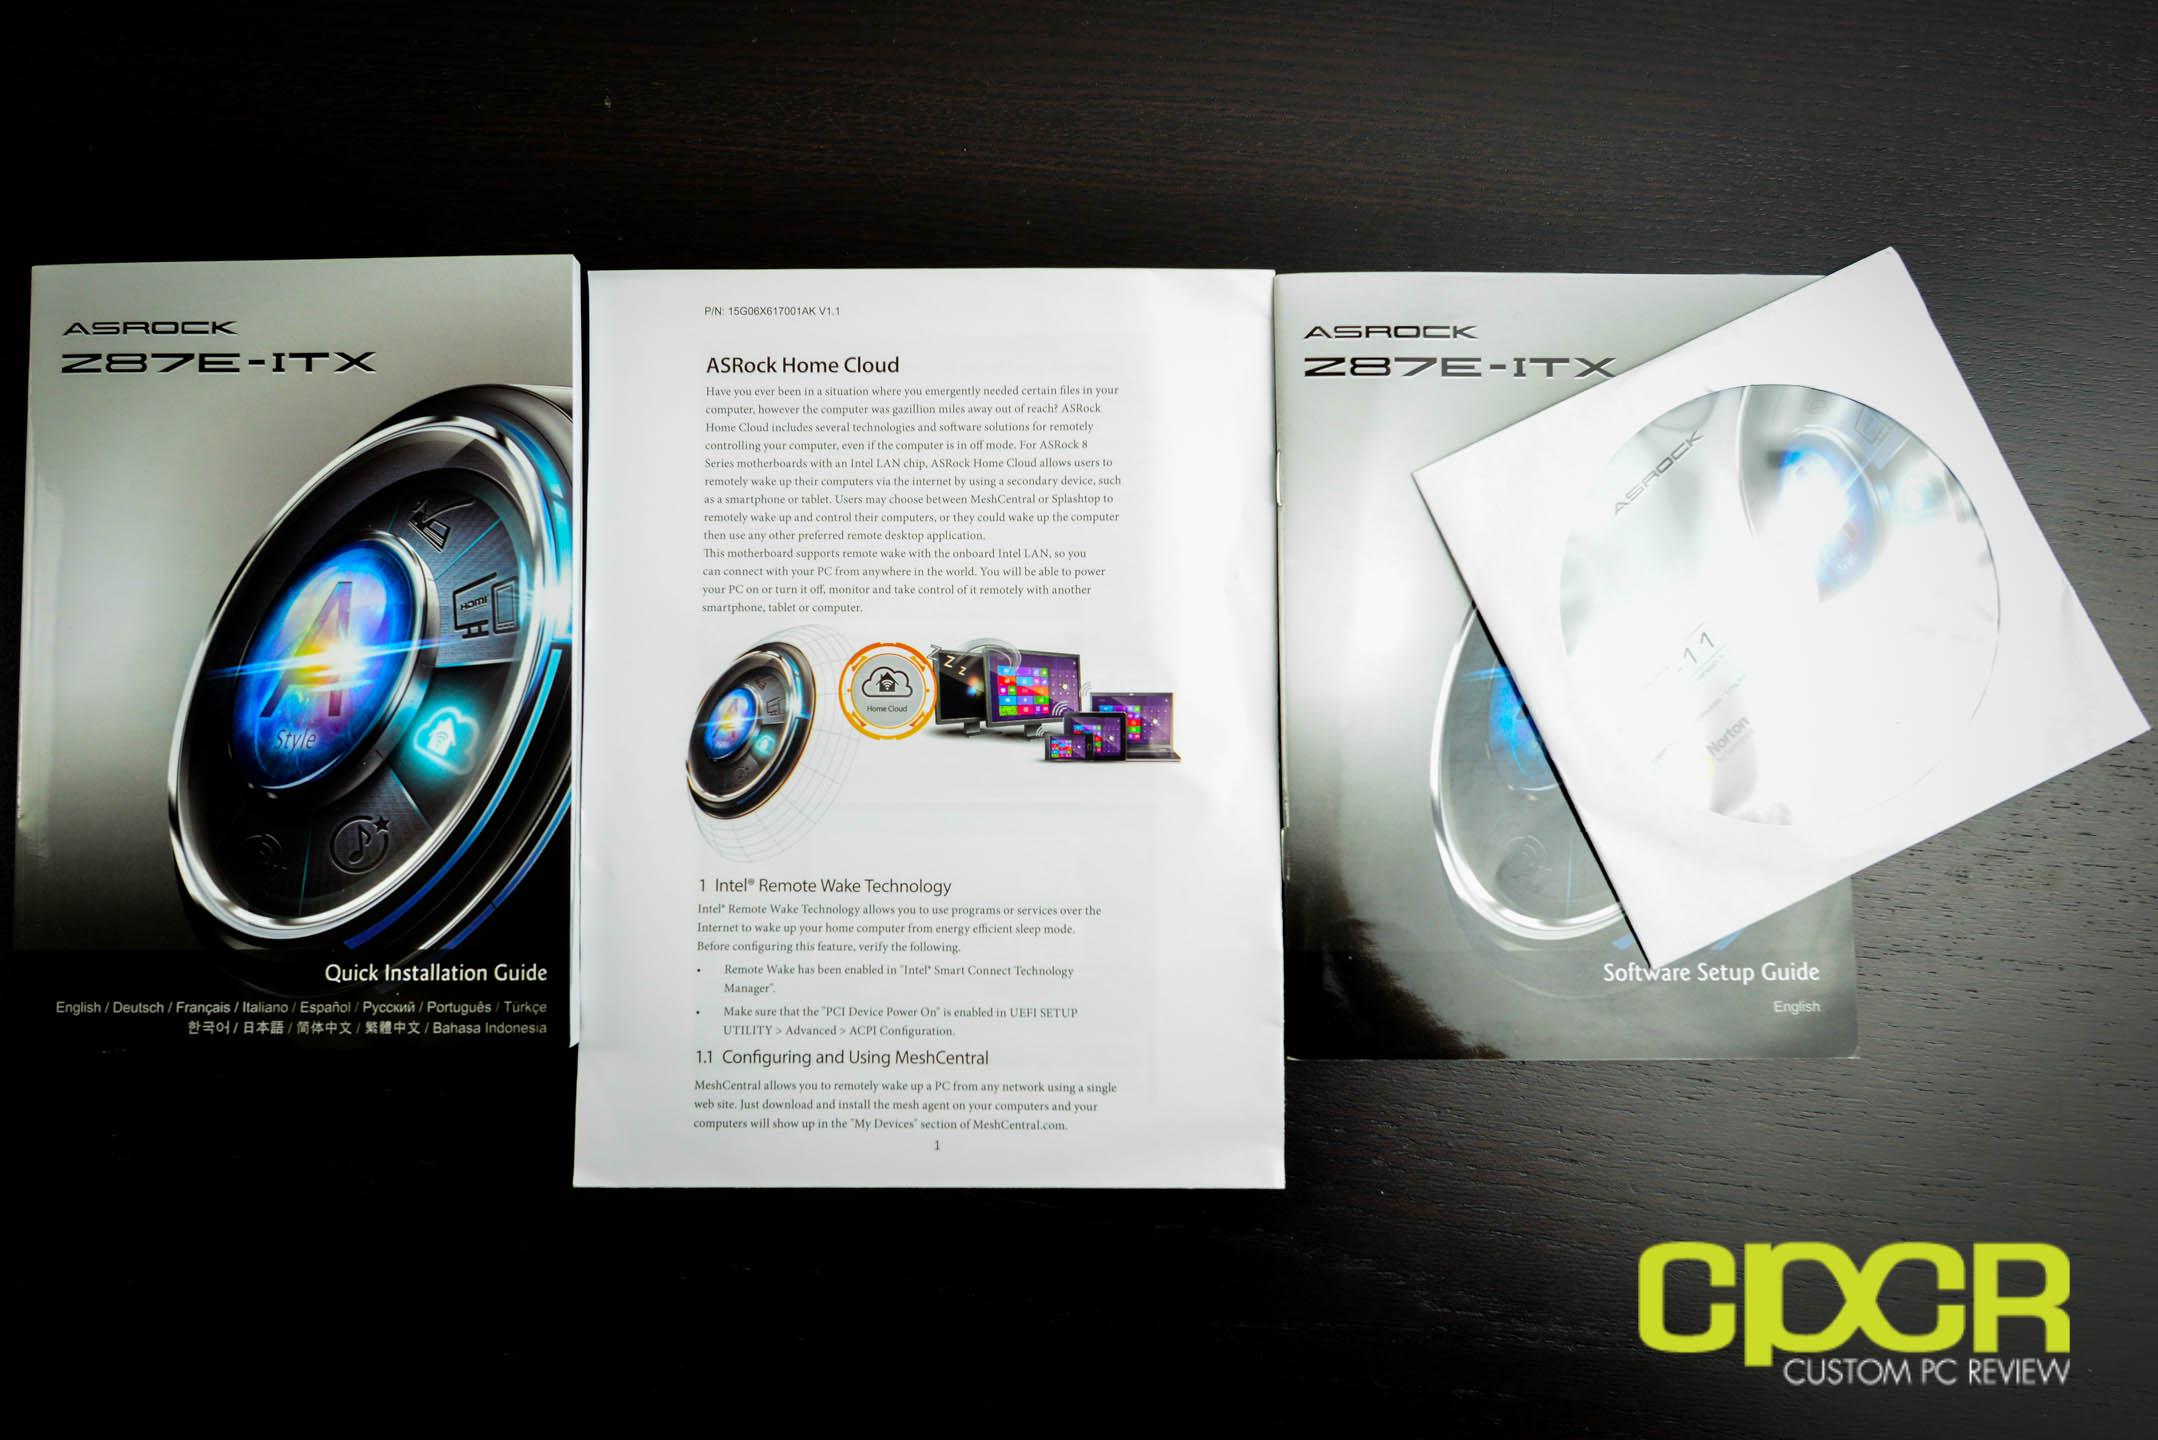 Review: ASRock Z87E-ITX Mini-ITX Motherboard | Custom PC Review